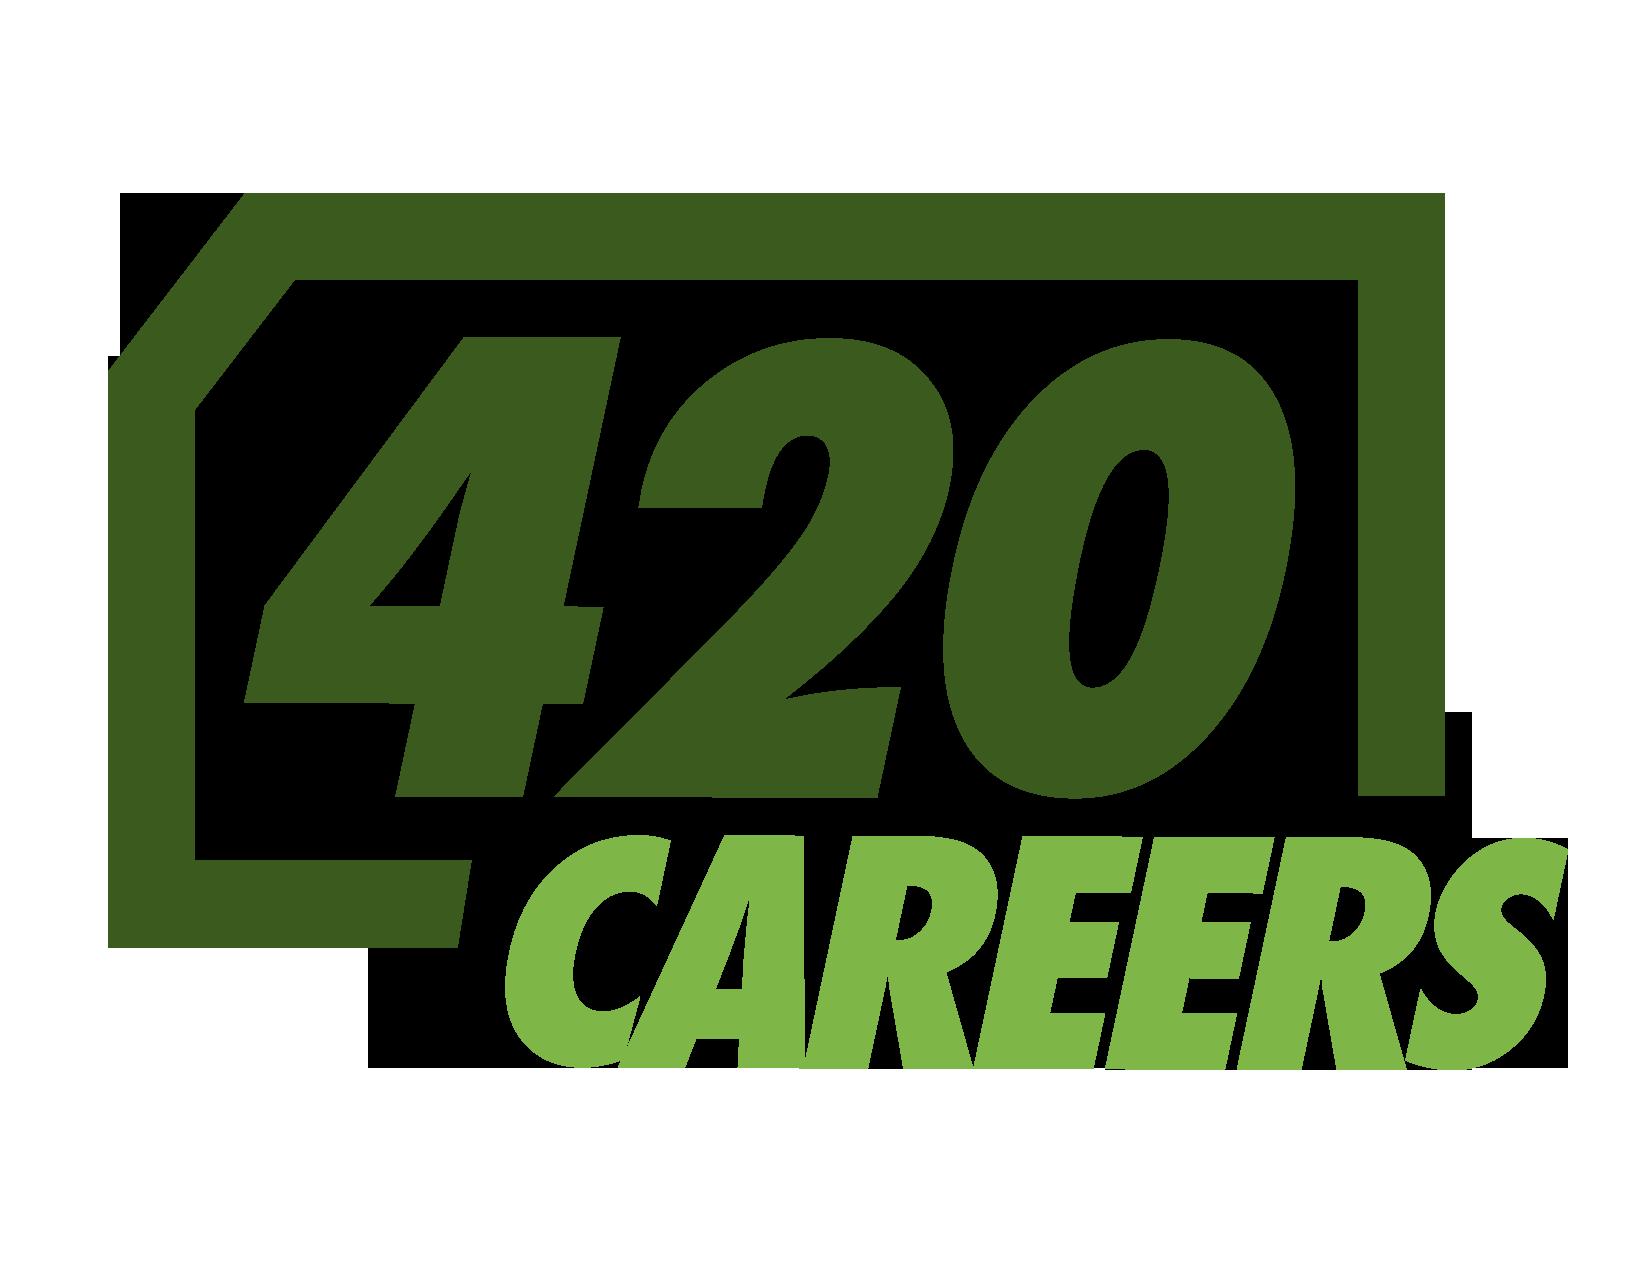 420 Careers